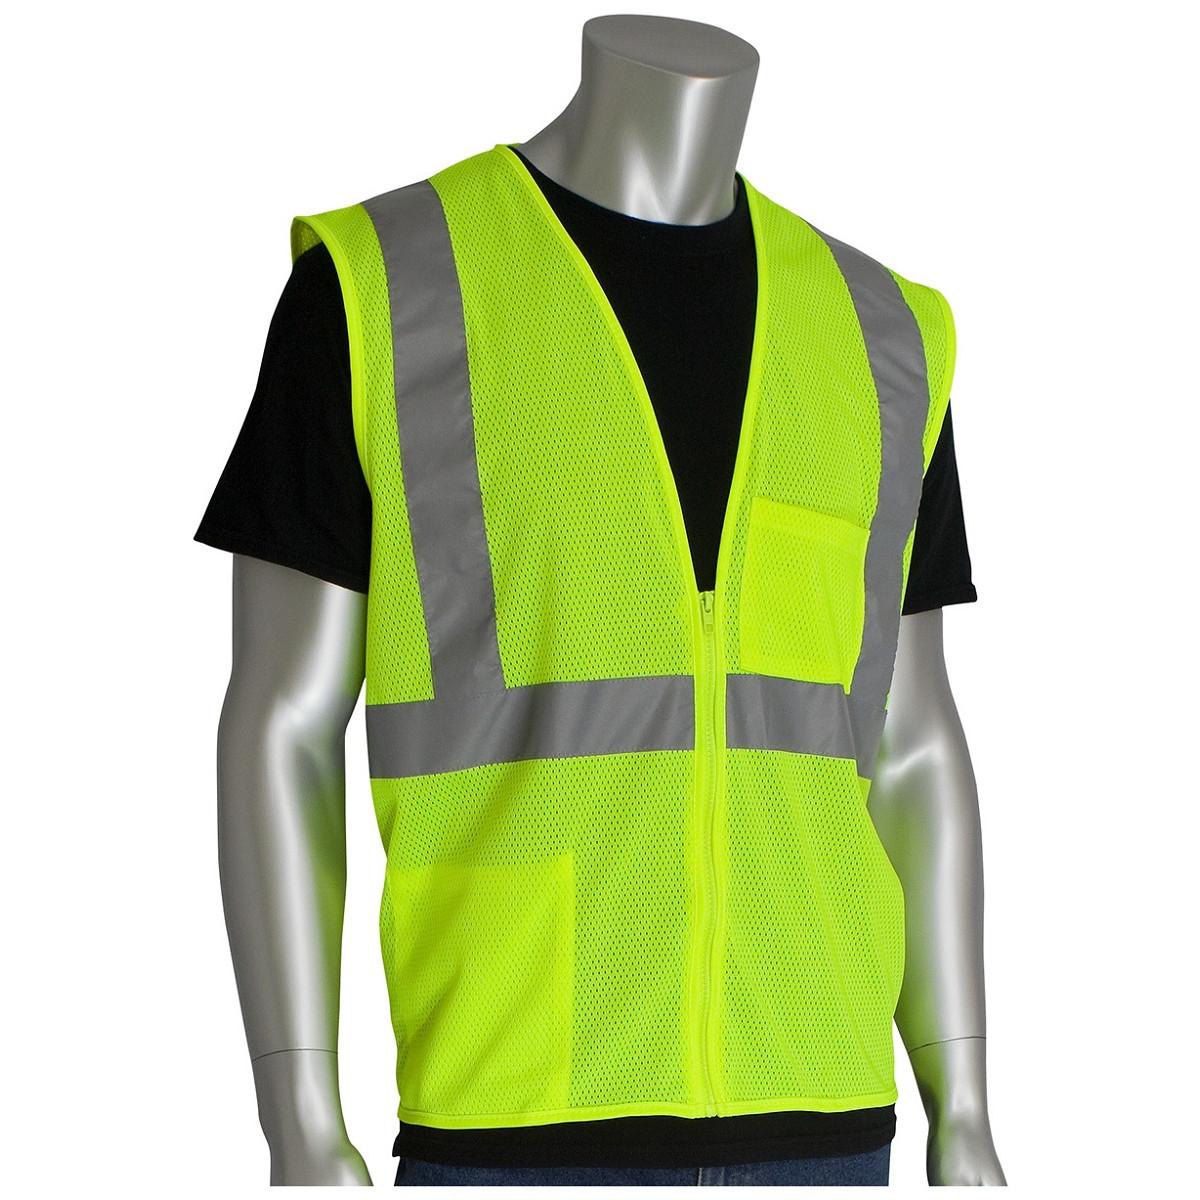 Hi-Vis Safety Vest Reflective ANSI Class 2 for Construction